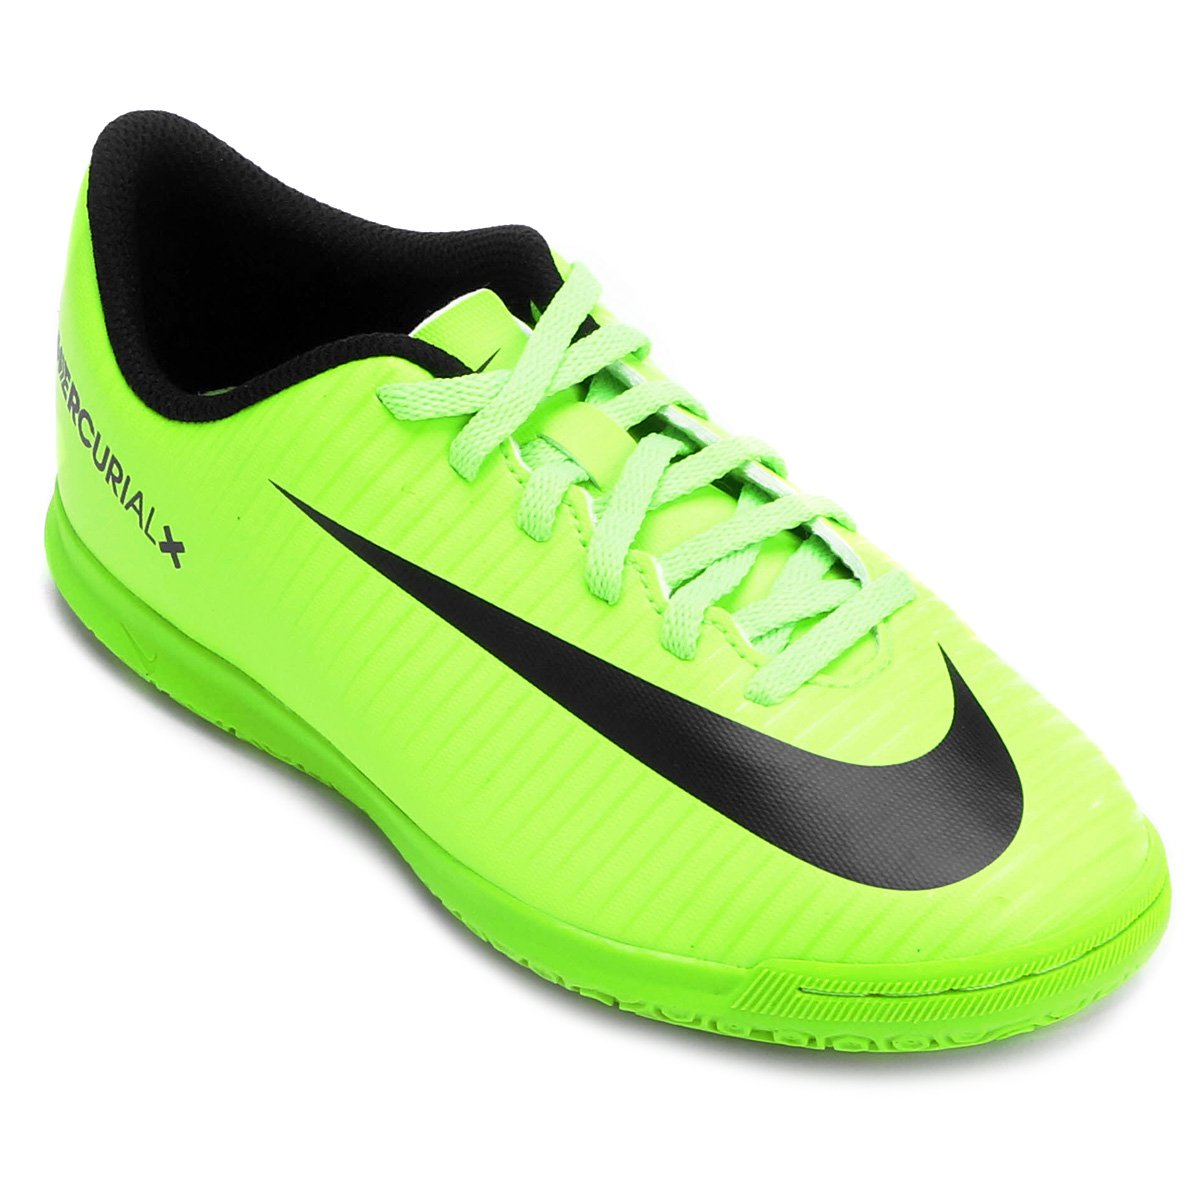 58d36f64a7 Chuteira Futsal Infantil Nike Mercurial Vortex 3 IC - Compre Agora ...